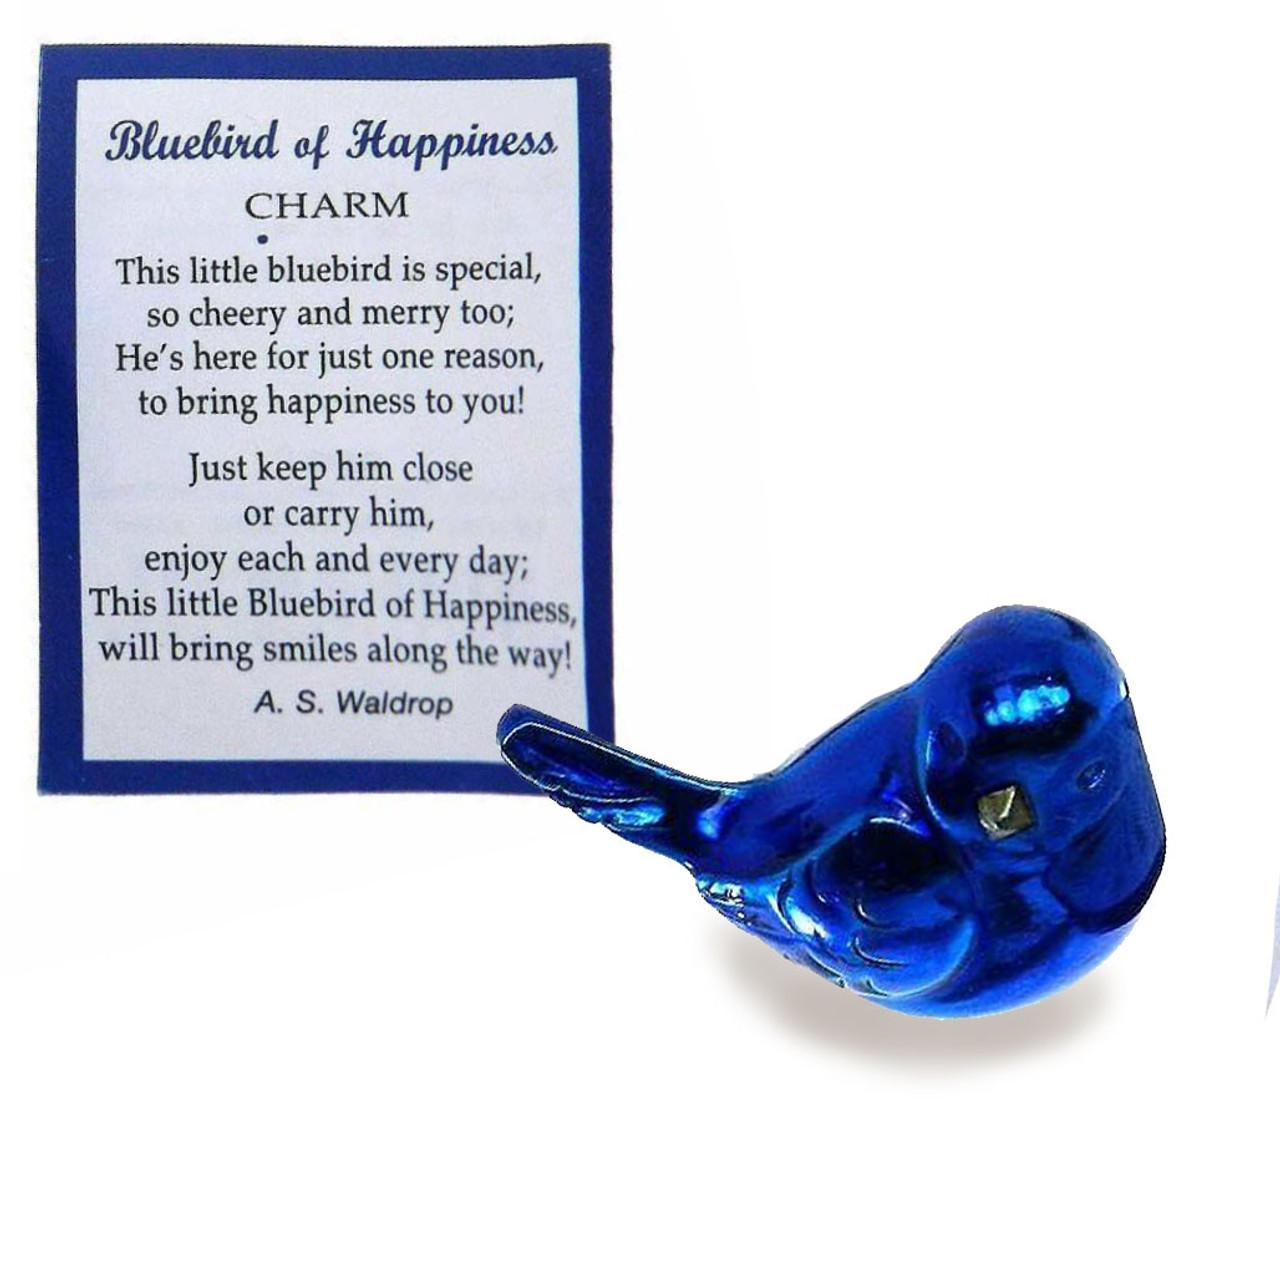 Bluebird Charm of Happiness